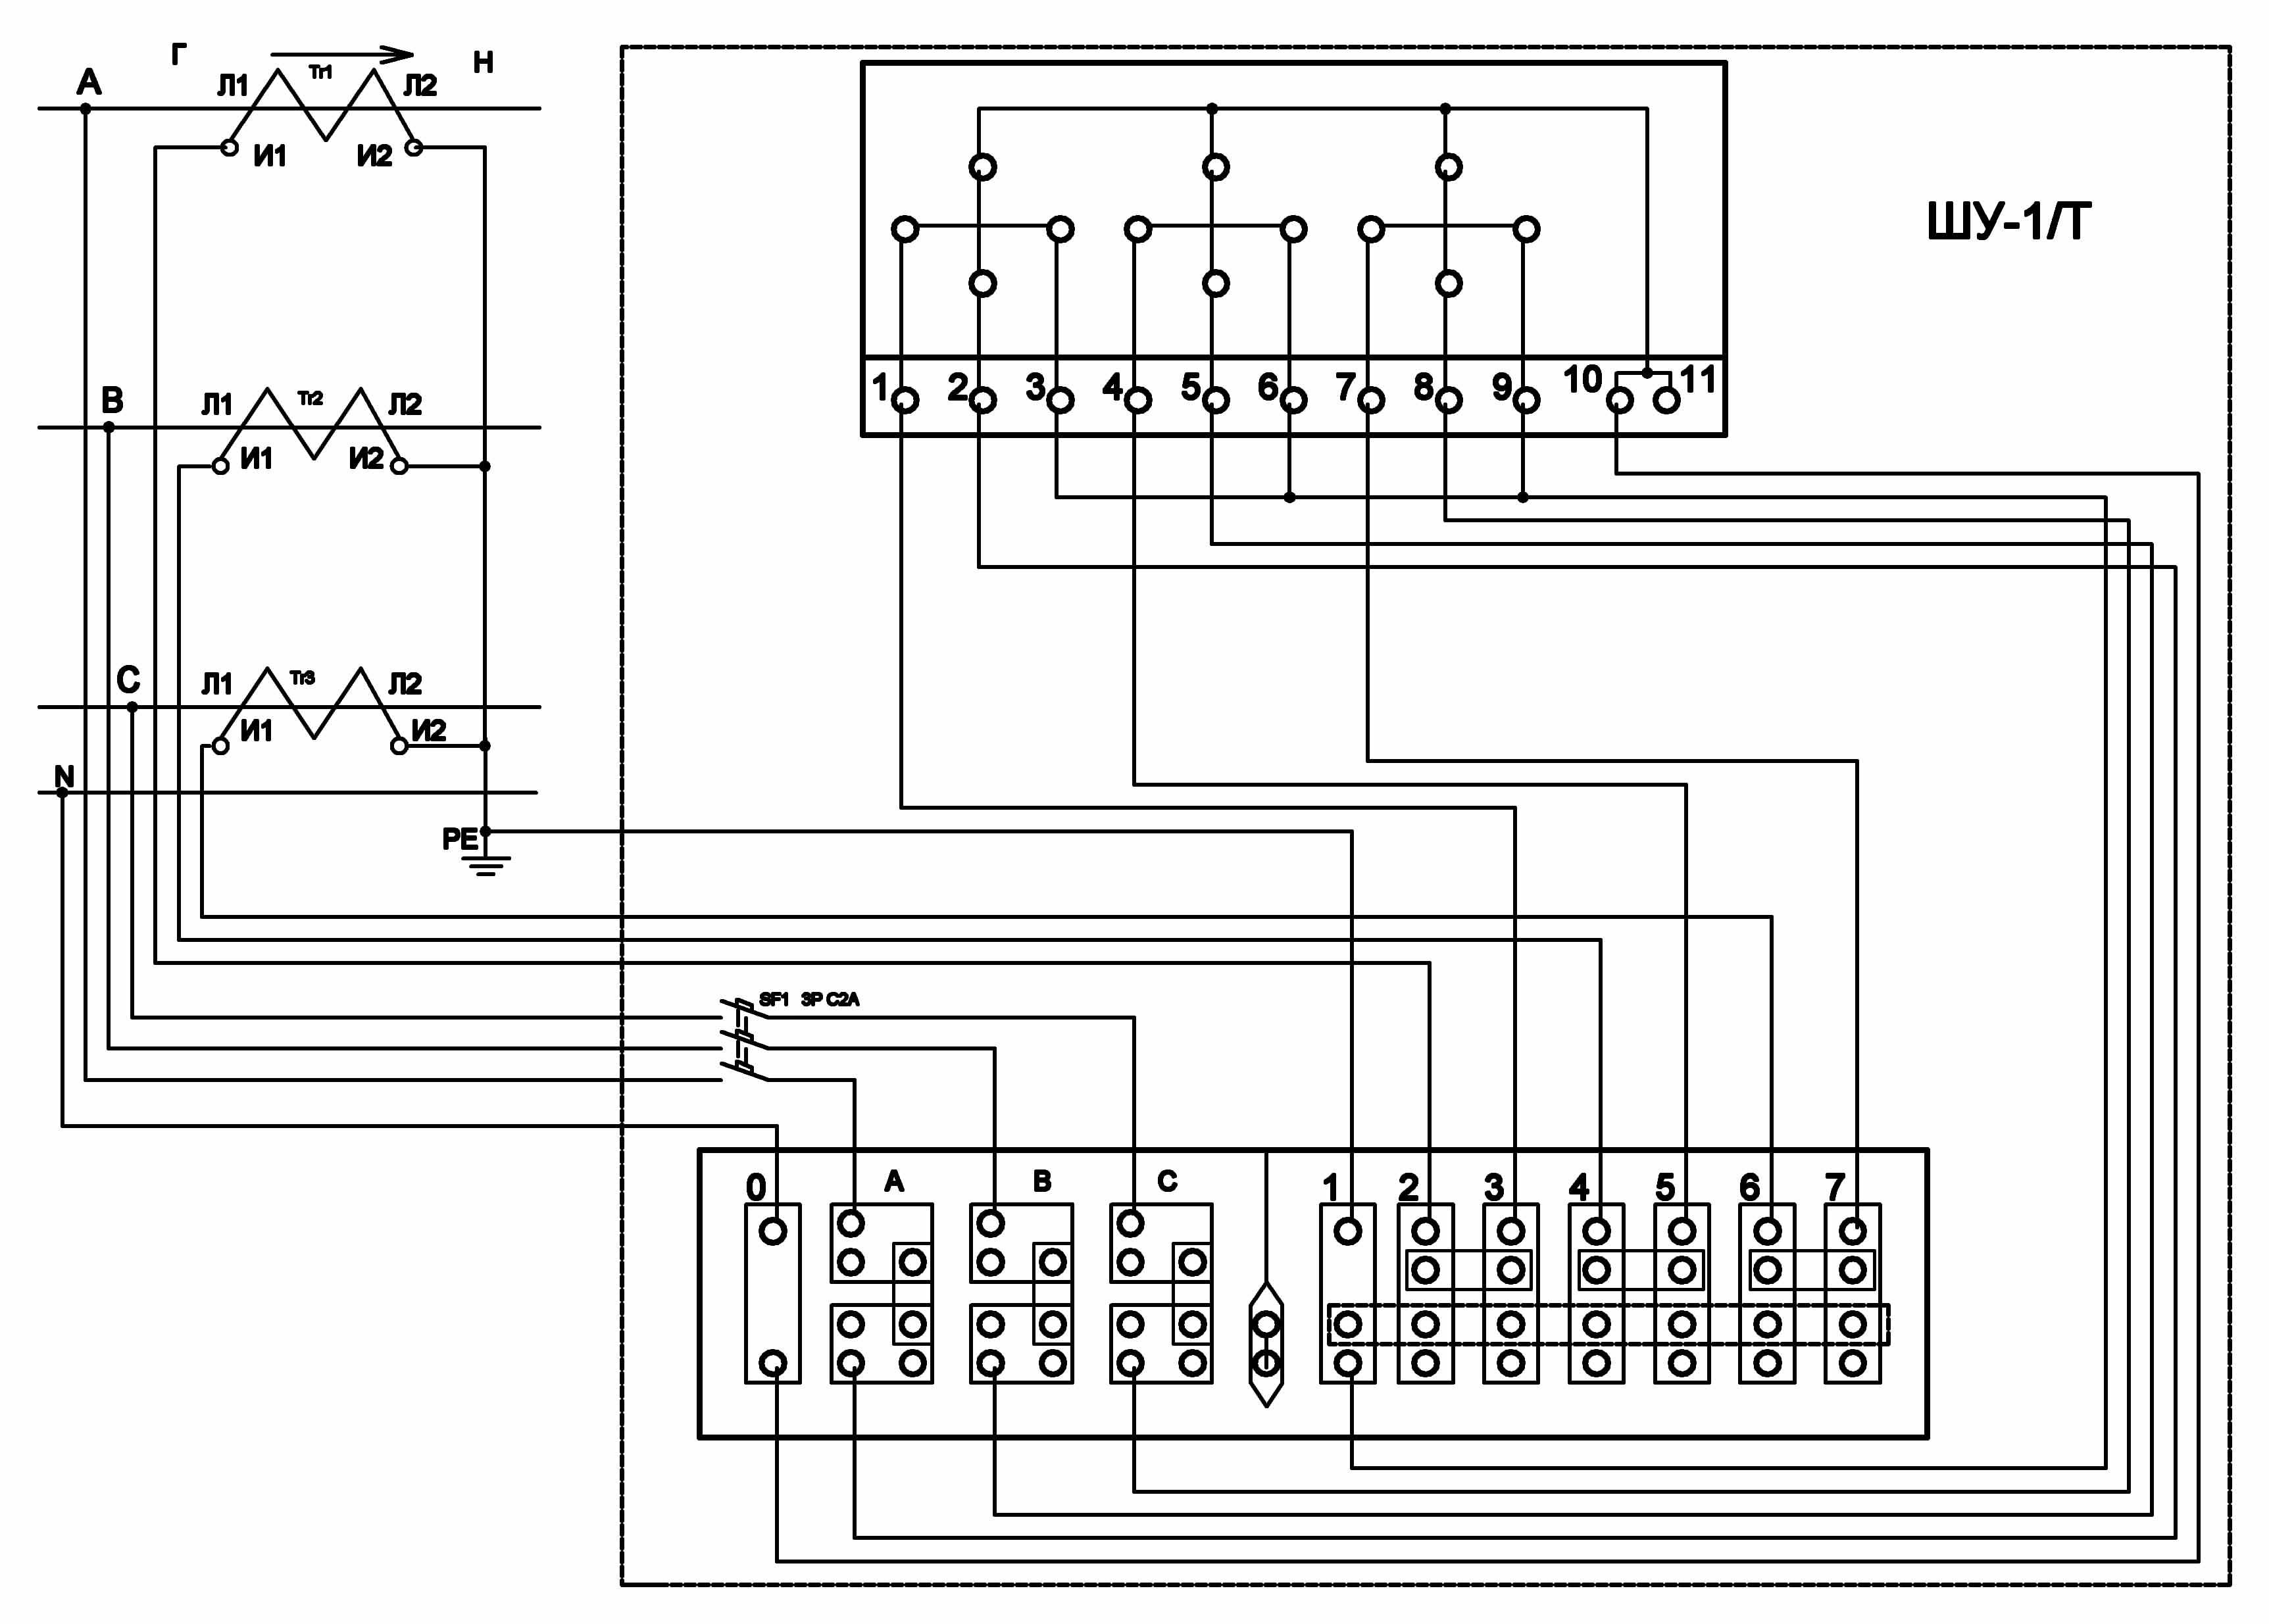 Счетчик псч-4тм.05 схема подключения